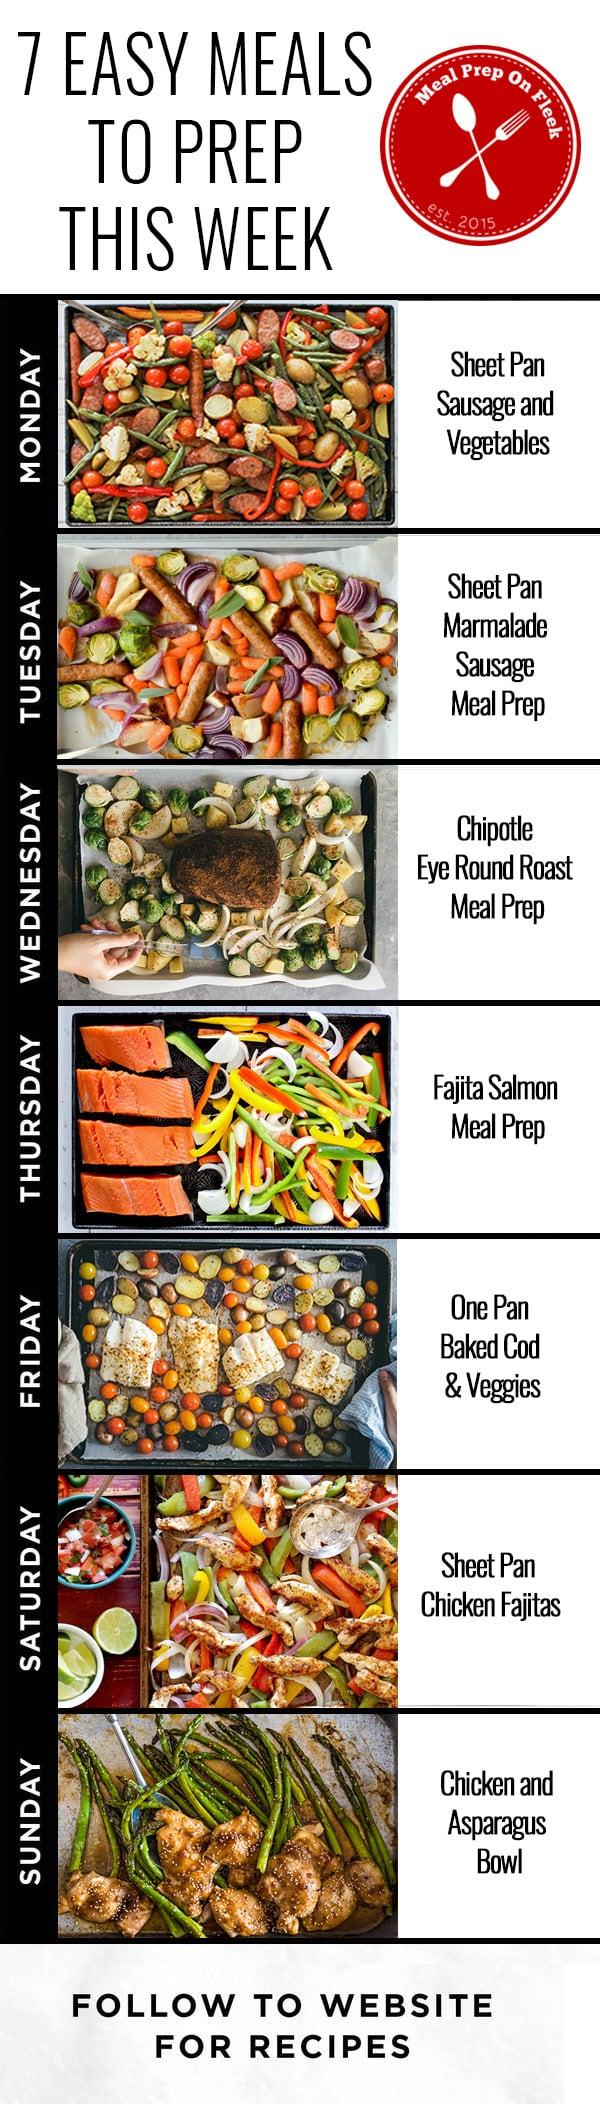 One Pan Make Ahead Meal Prep Recipes